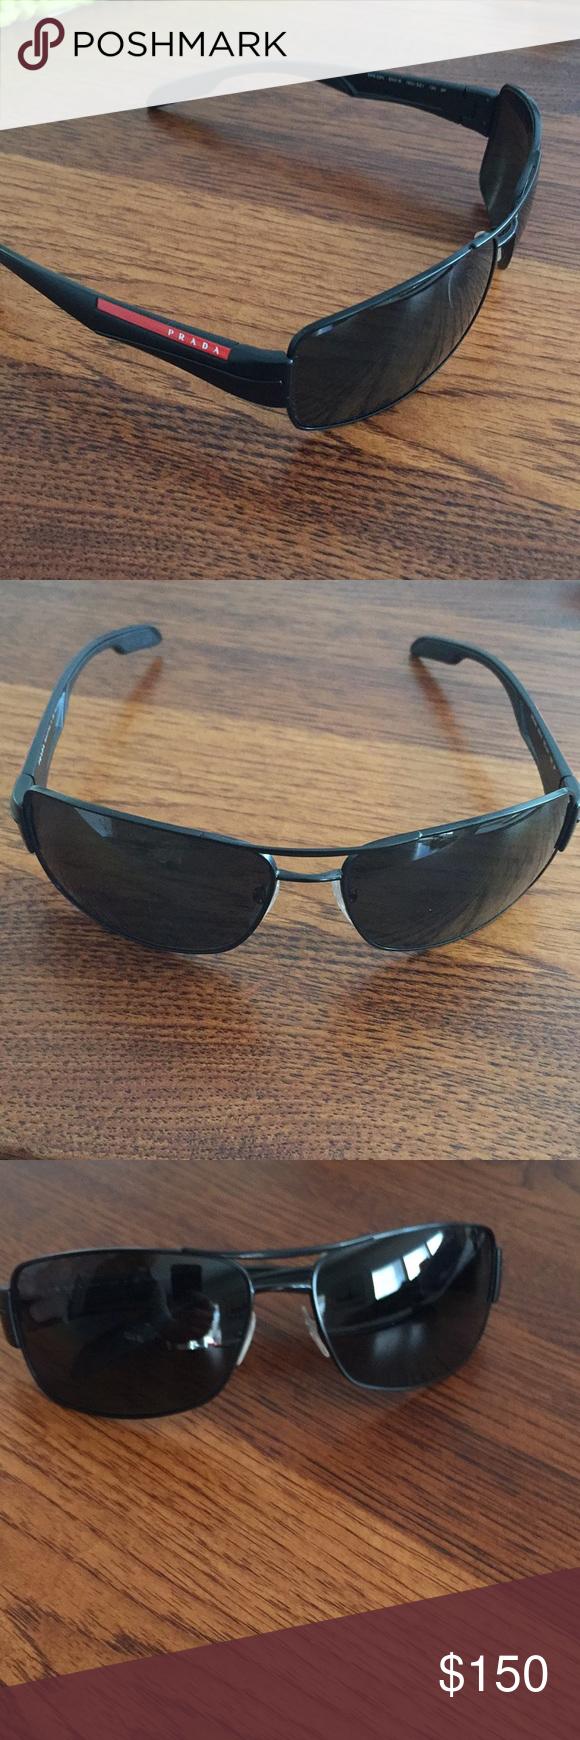 0689860aacd Prada Polarized sunglasses men s. Like new